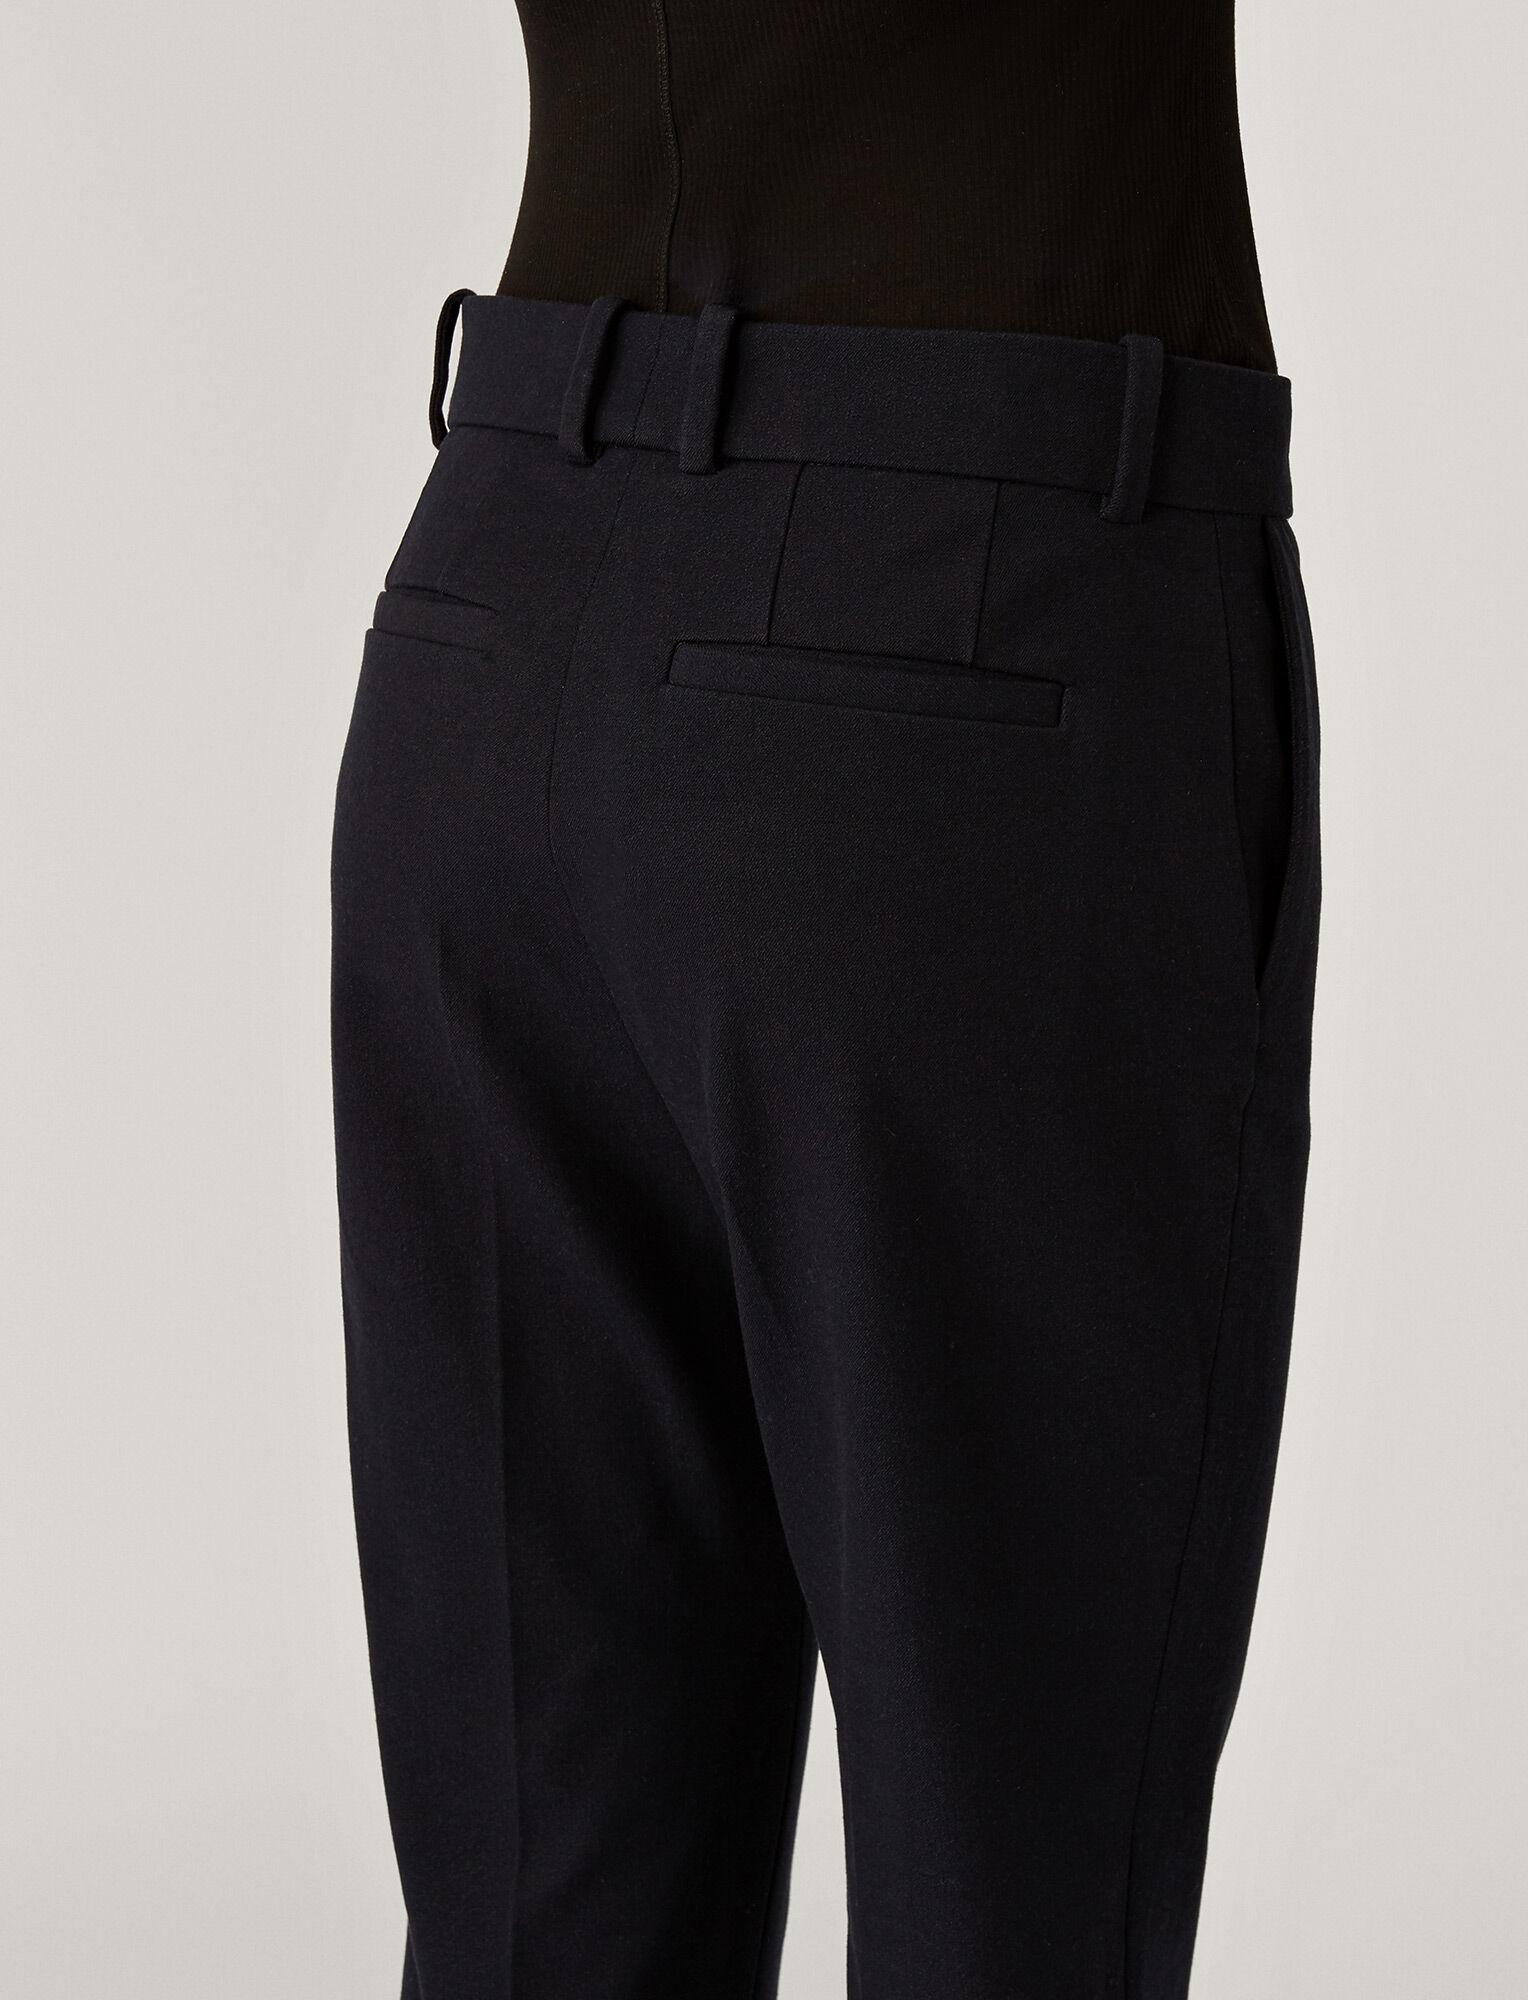 Joseph, Cole Gabardine Stretch Trousers, in NAVY